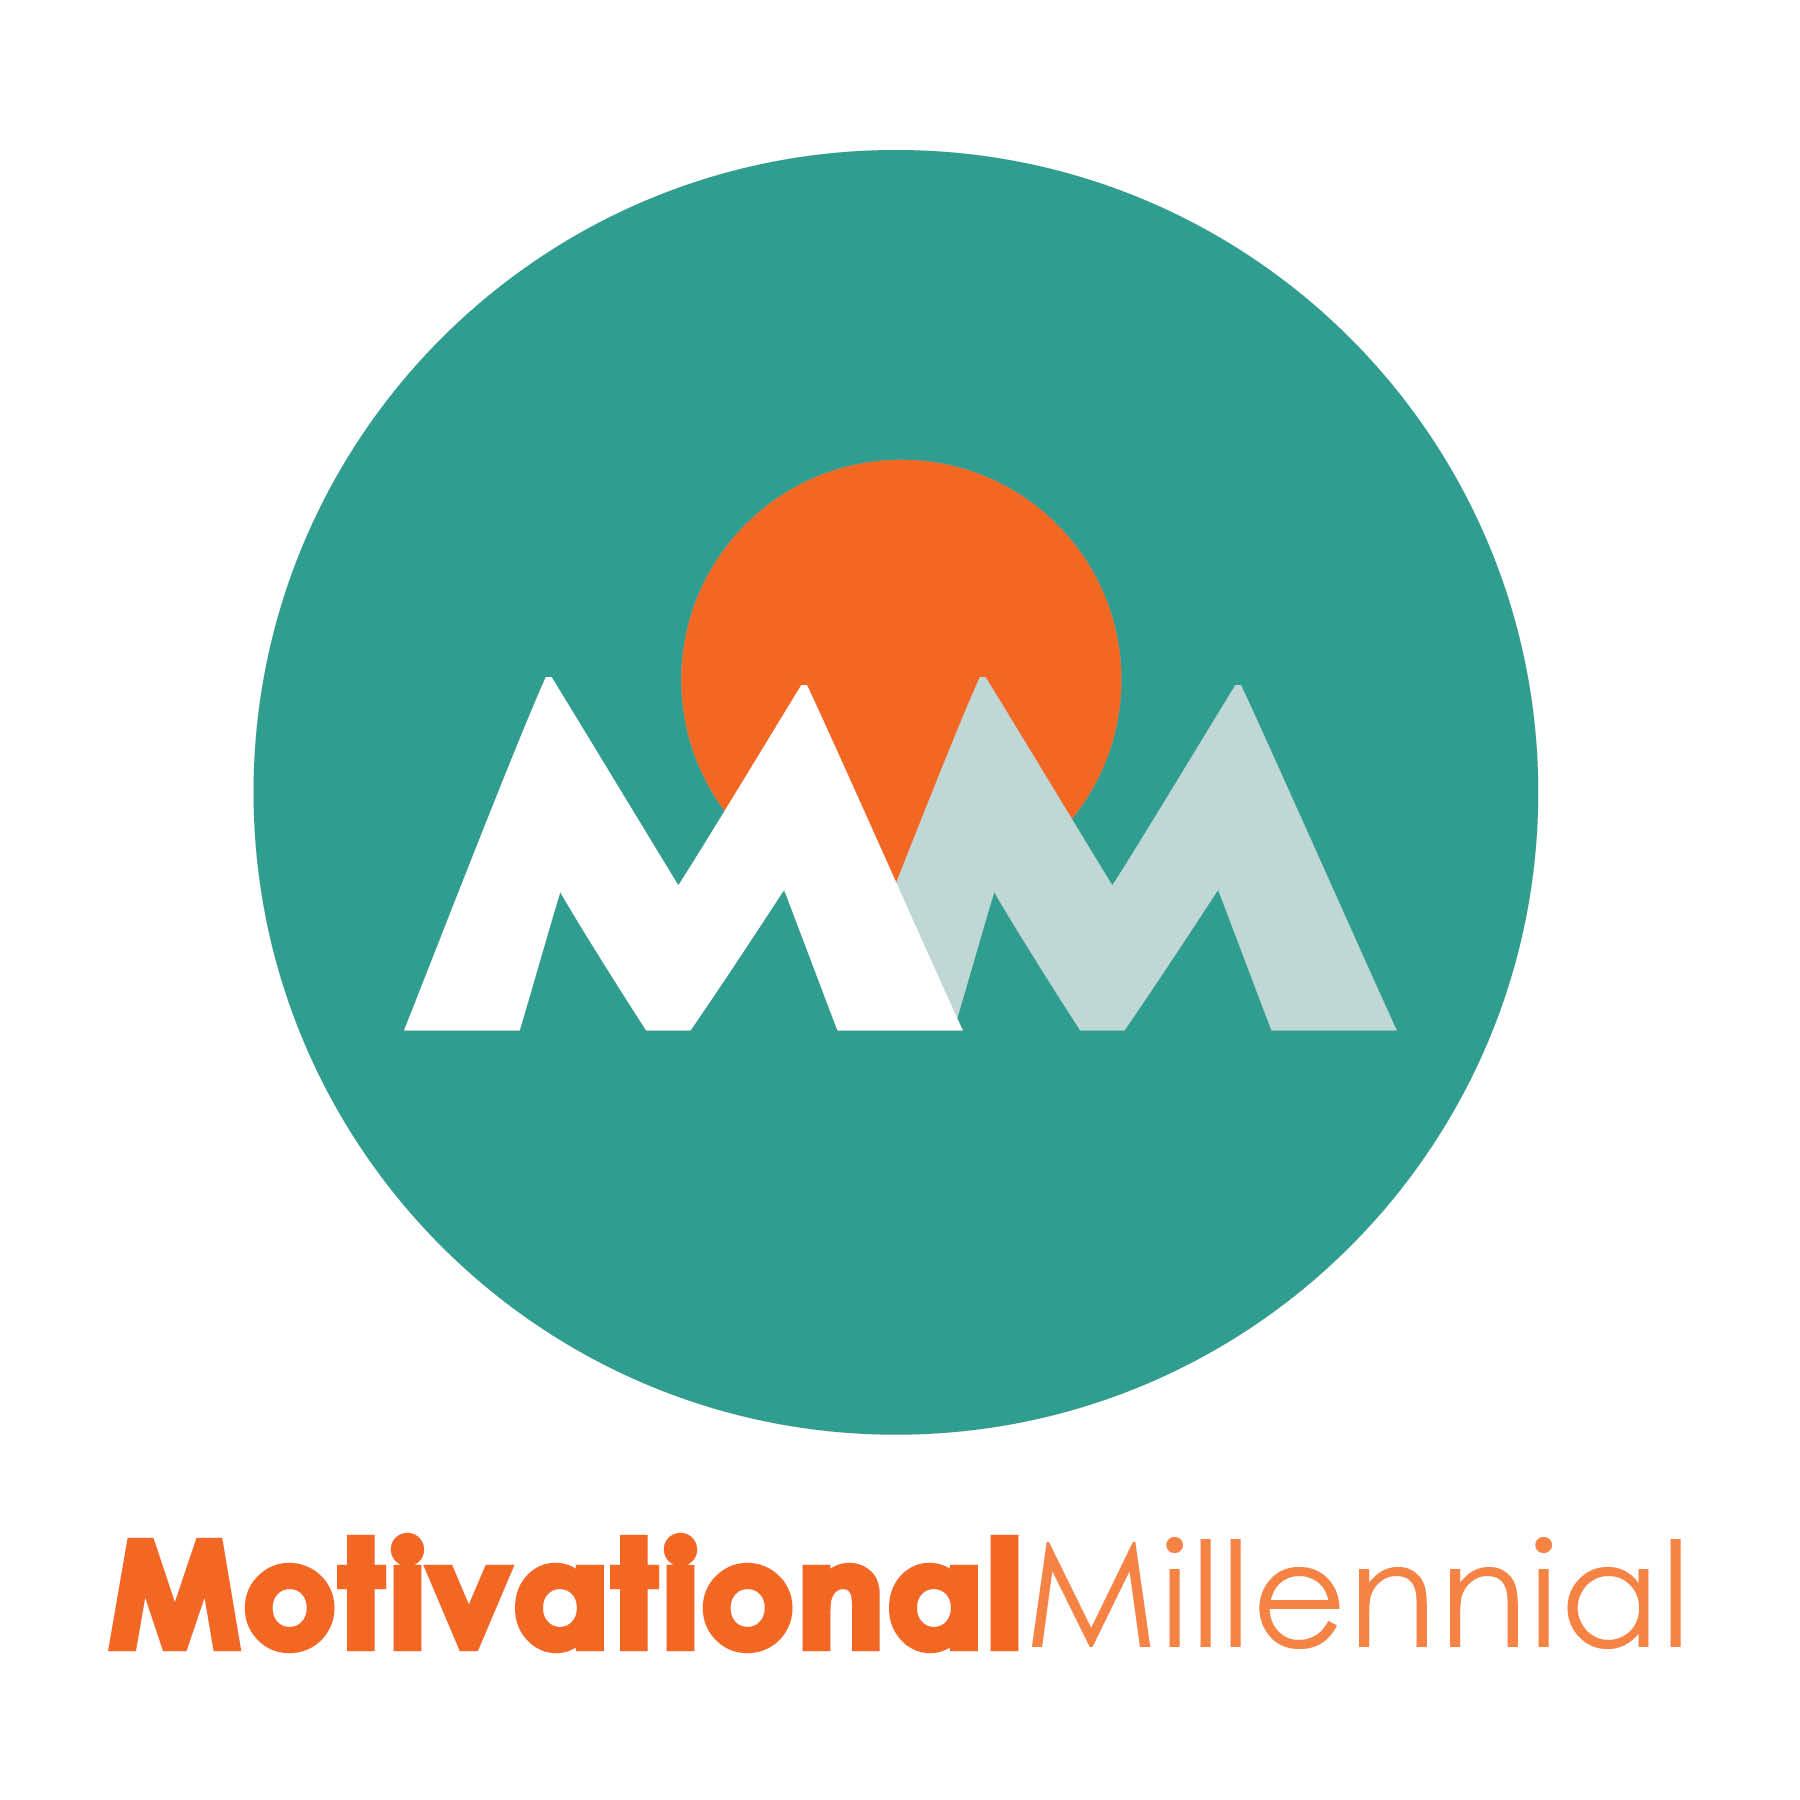 Motivational Millennial | Passion | Dreams | Overcome Challenges | Purpose | Fulfillment | Motivation show art